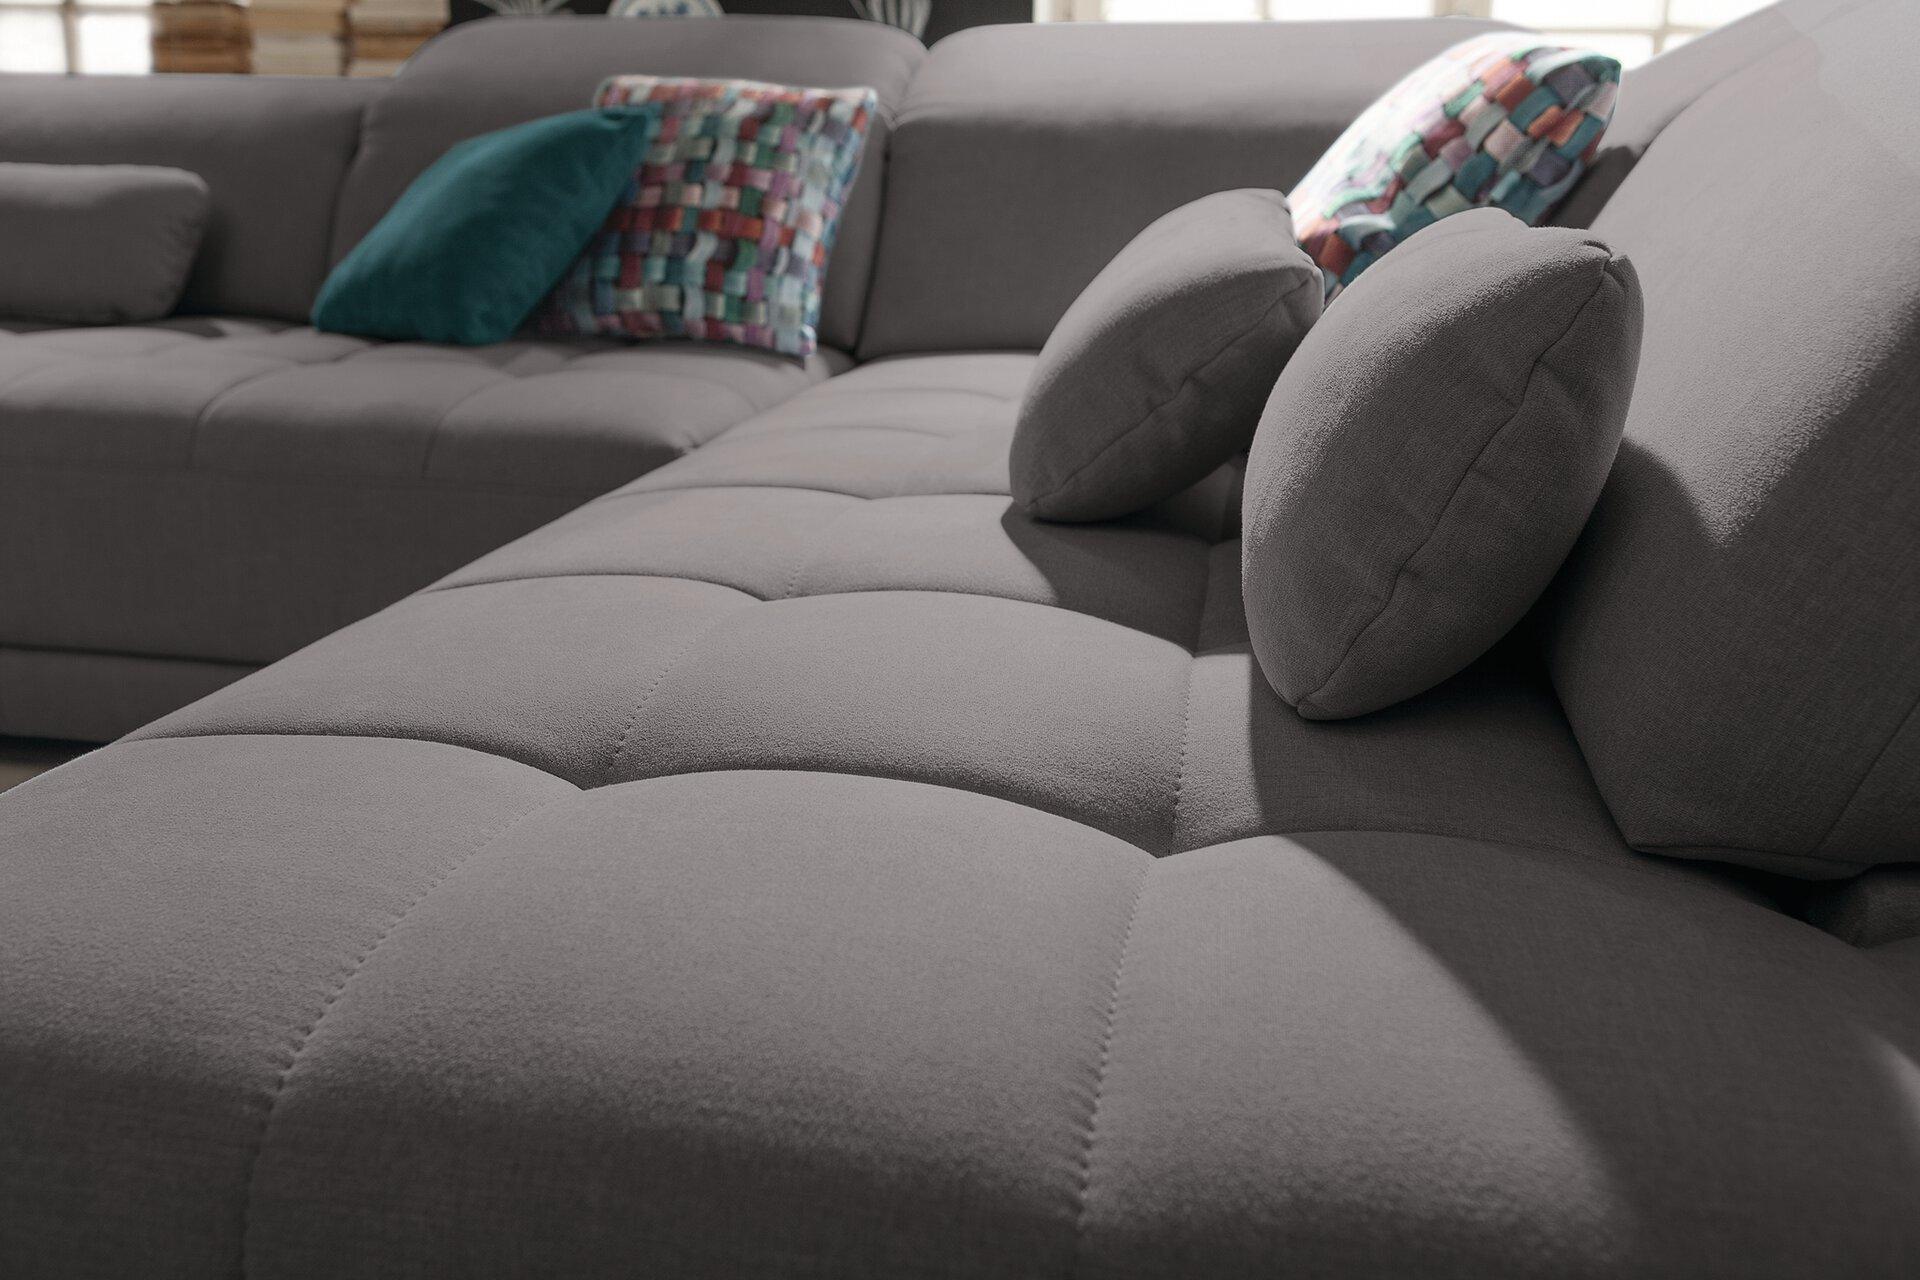 Ecksofa SO3200 set One by Musterring Textil grau 233 x 92 x 298 cm